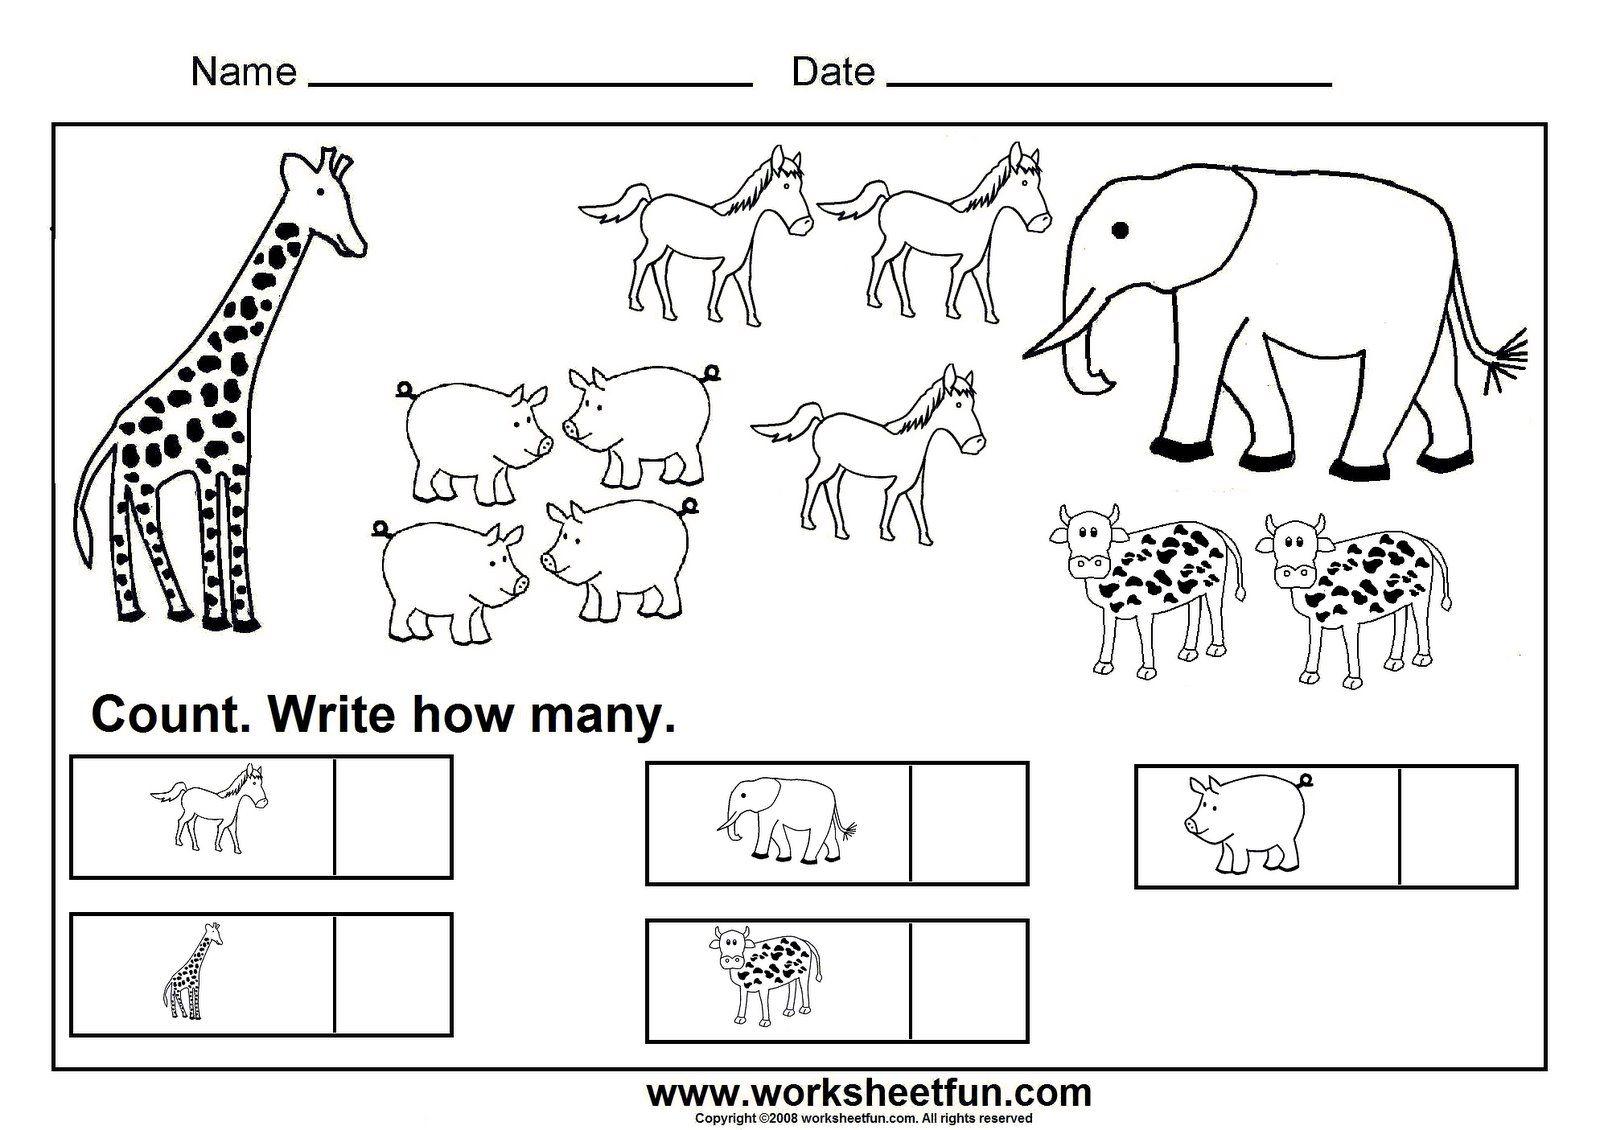 math worksheet : 1000 images about kindergarten math on pinterest  math  : Kindergarten Counting Worksheets